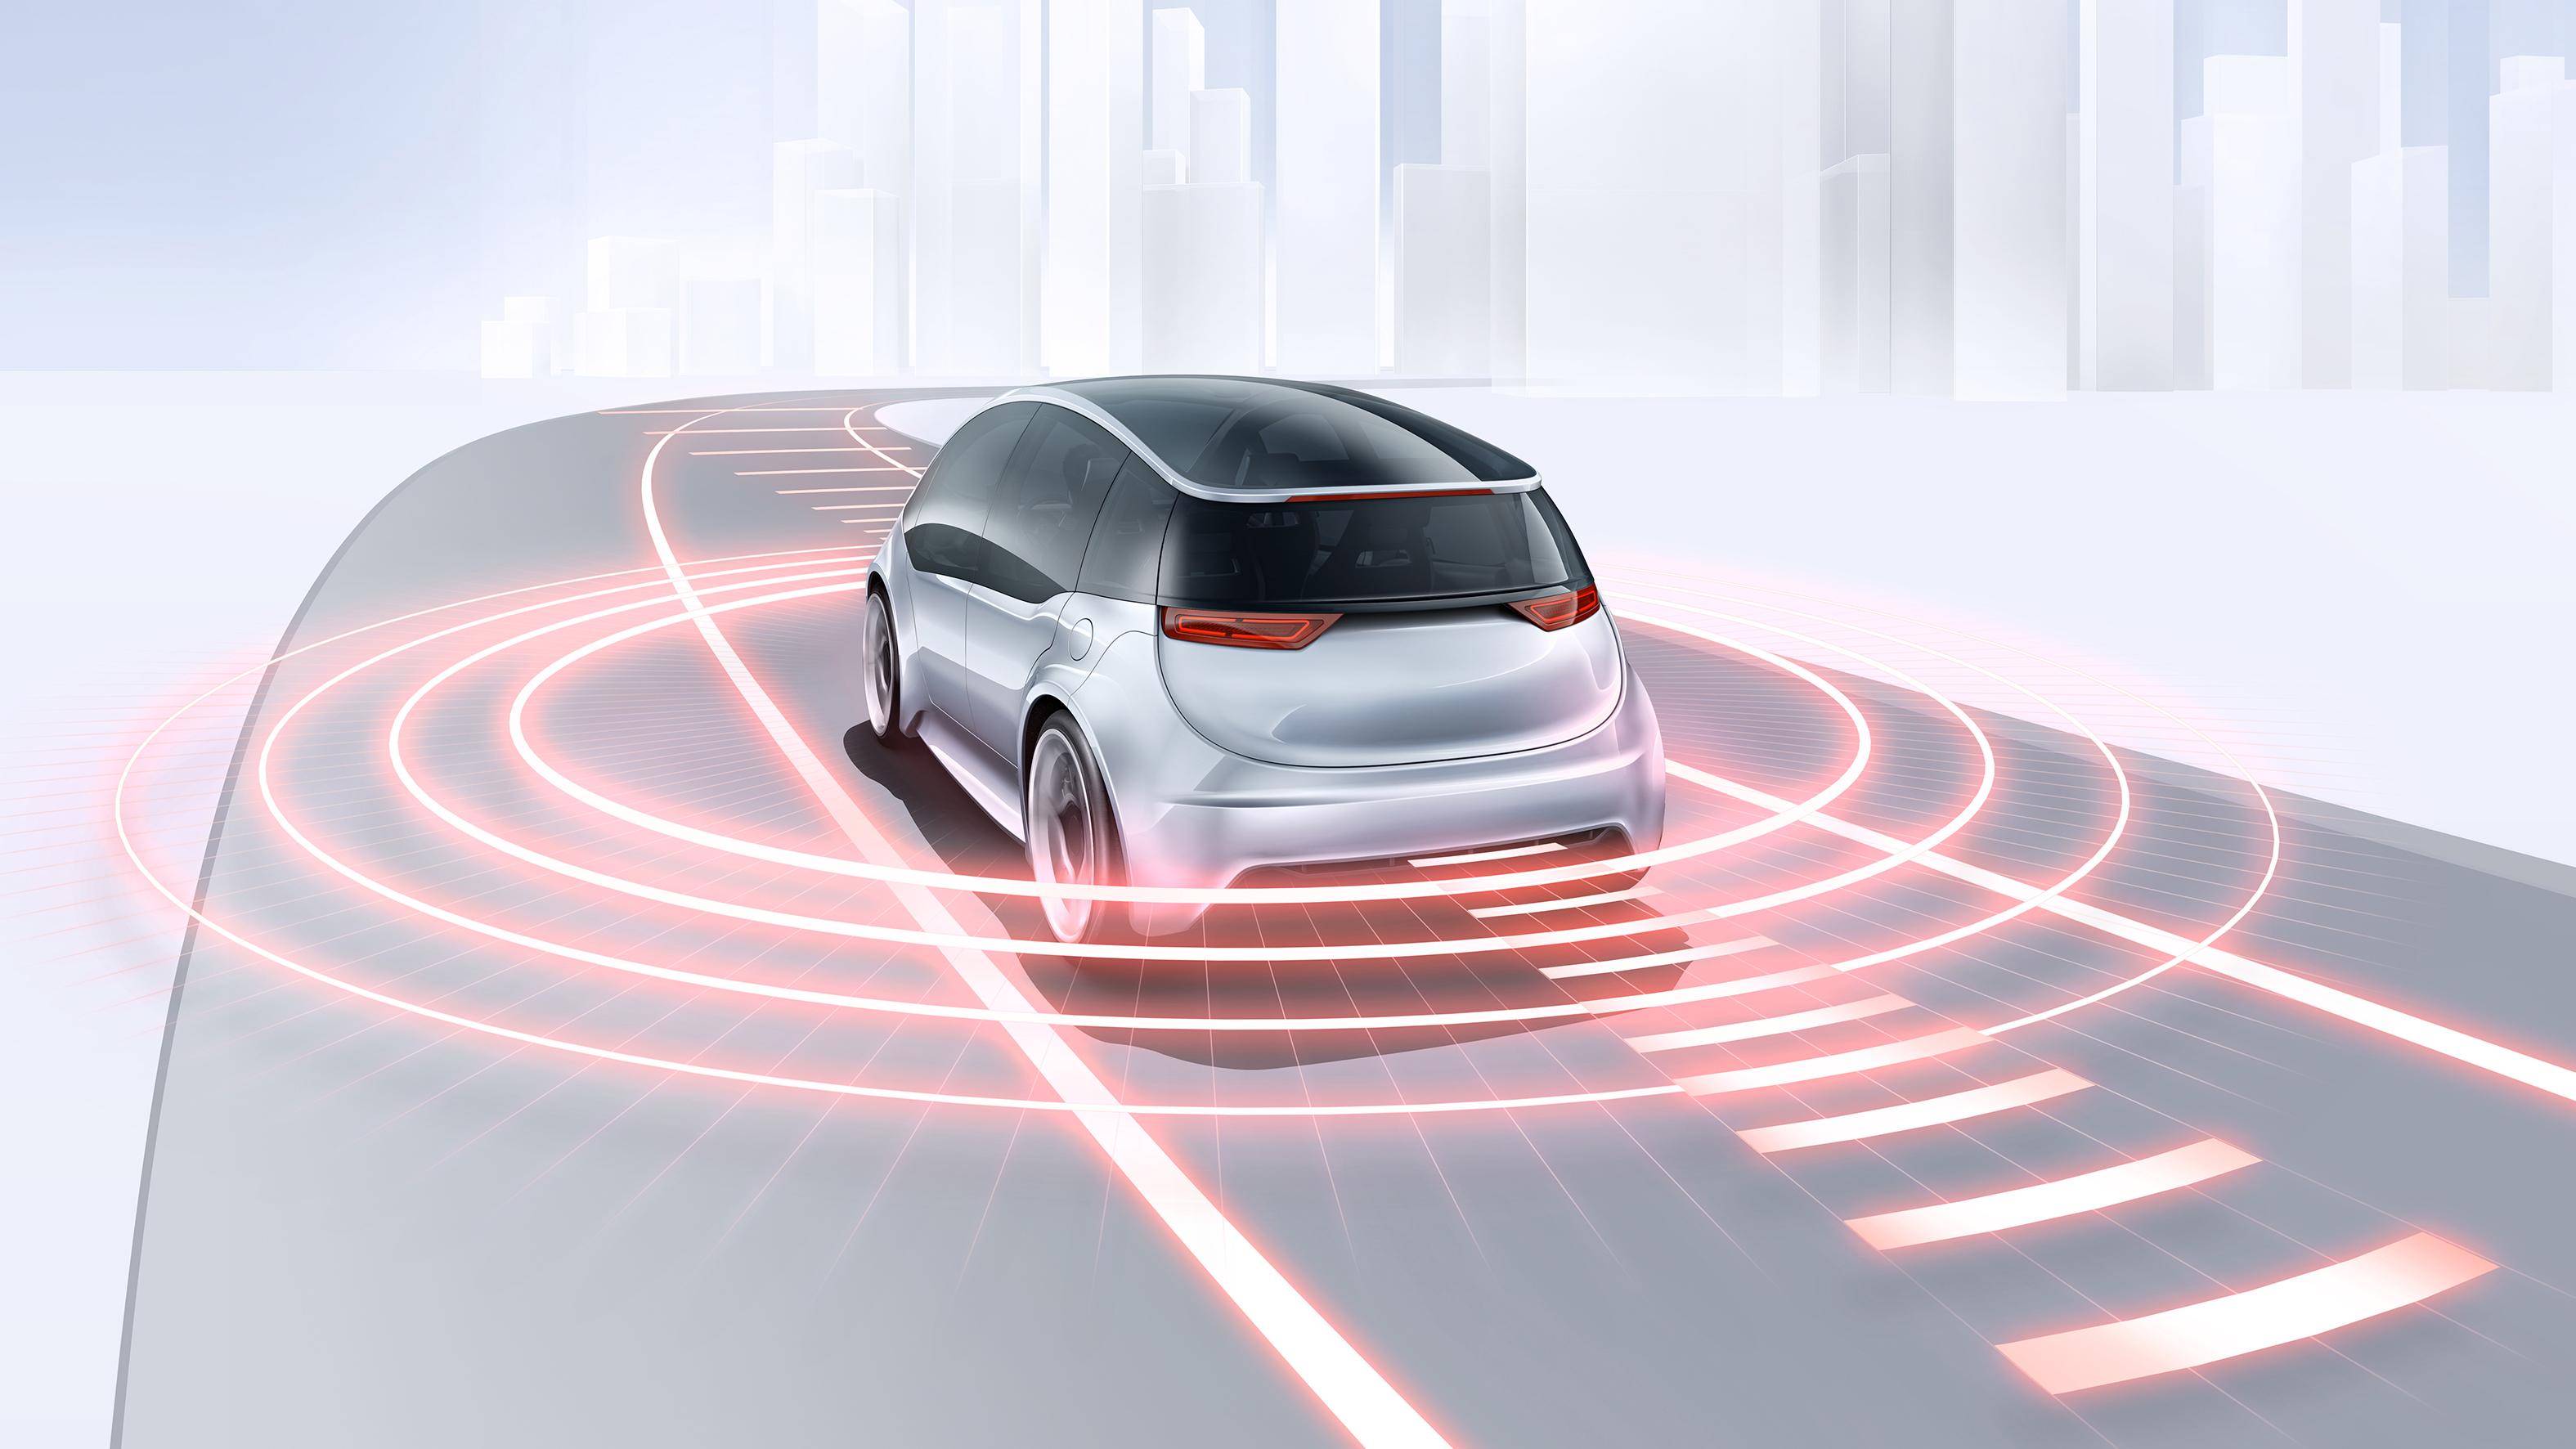 Bosch debuts long-range lidar sensor for autonomous vehicles   VentureBeat